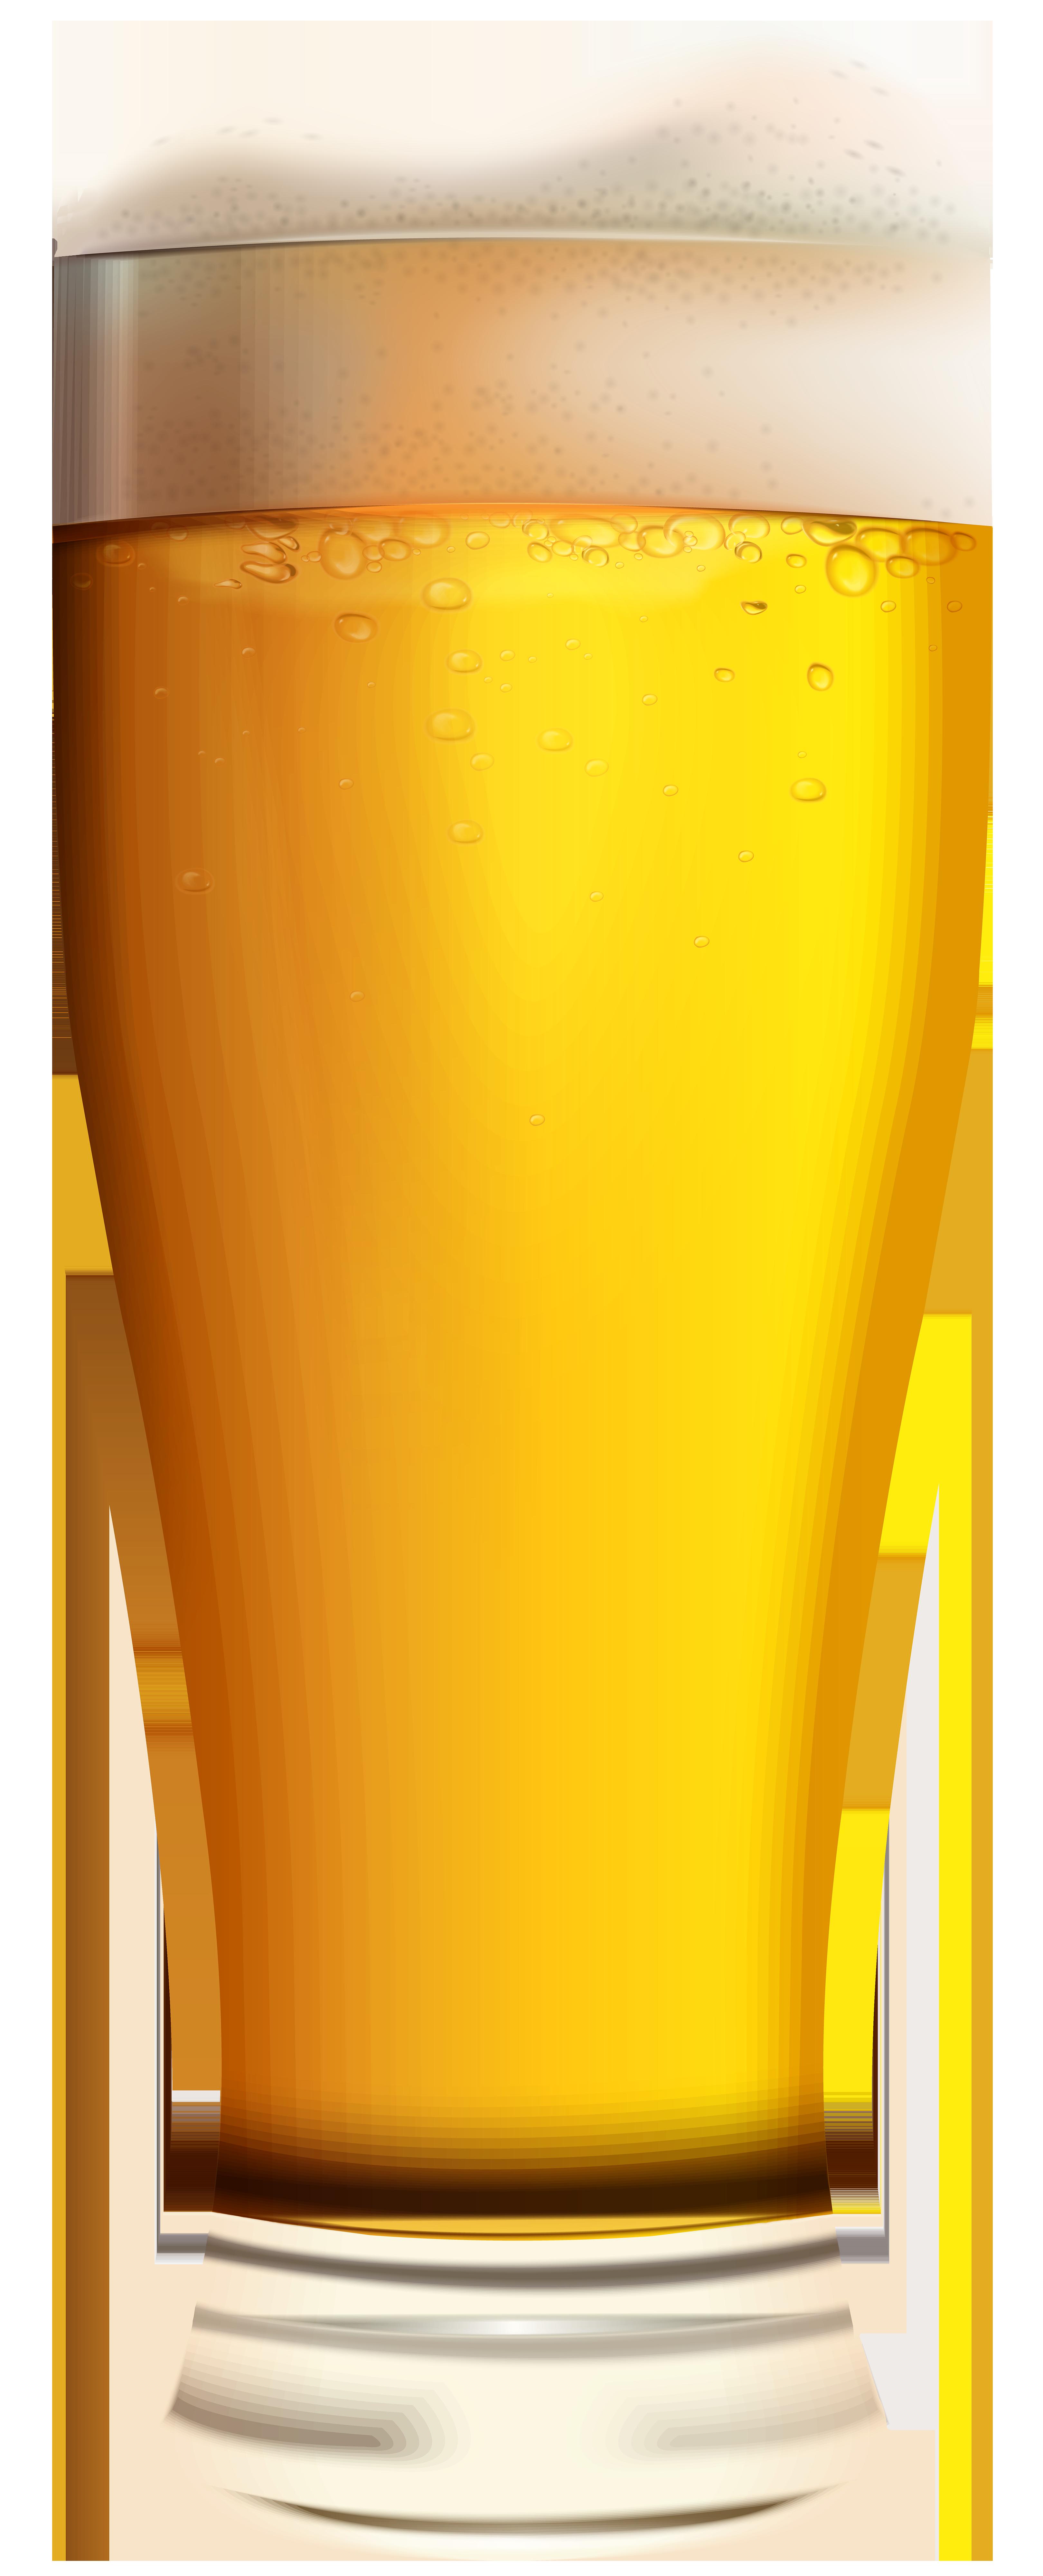 Glass of Light Beer PNG Clip Art Image.